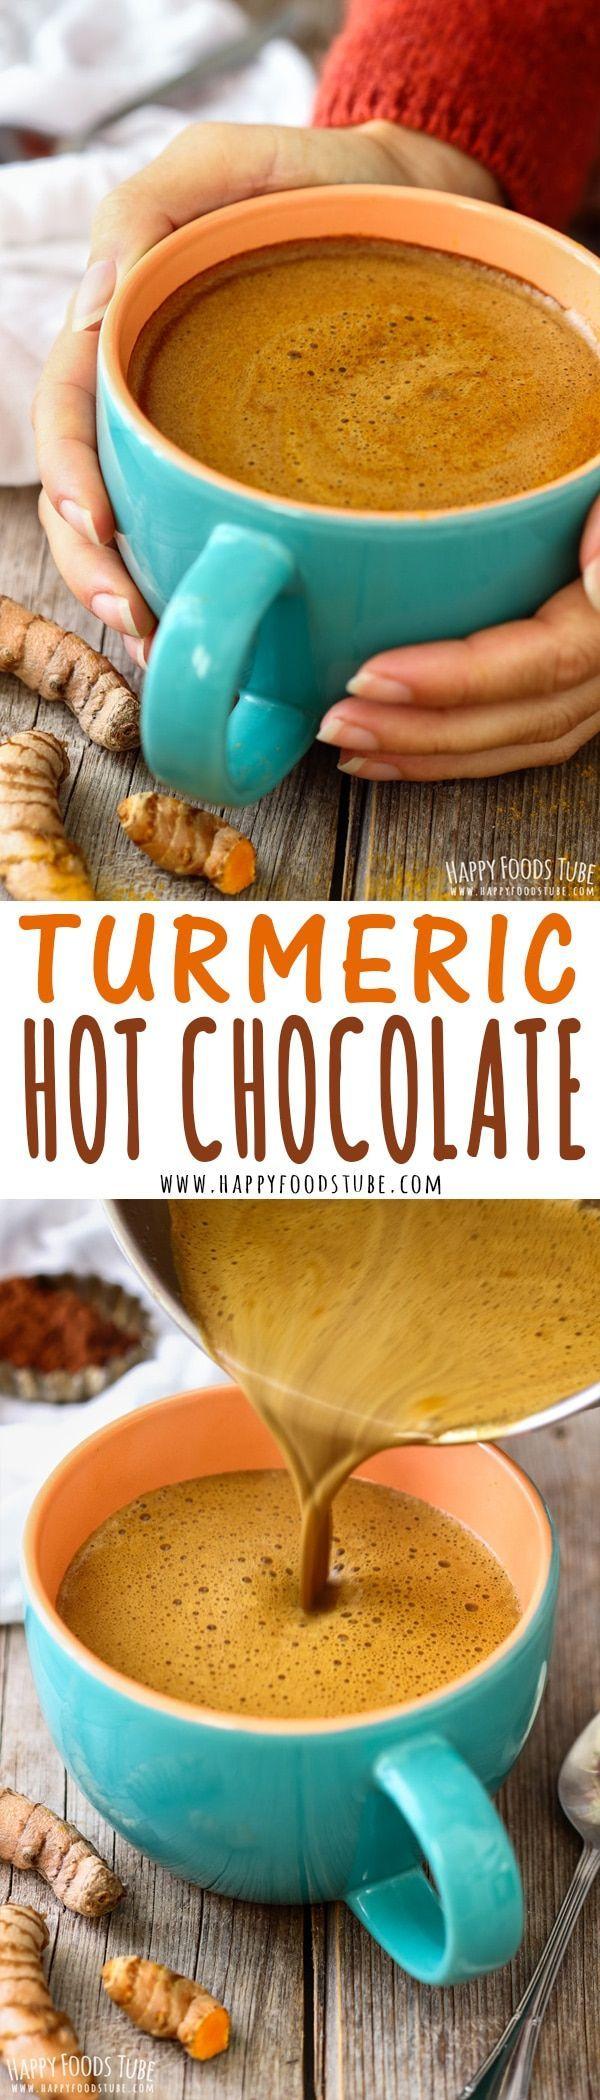 Turmeric hot chocolate